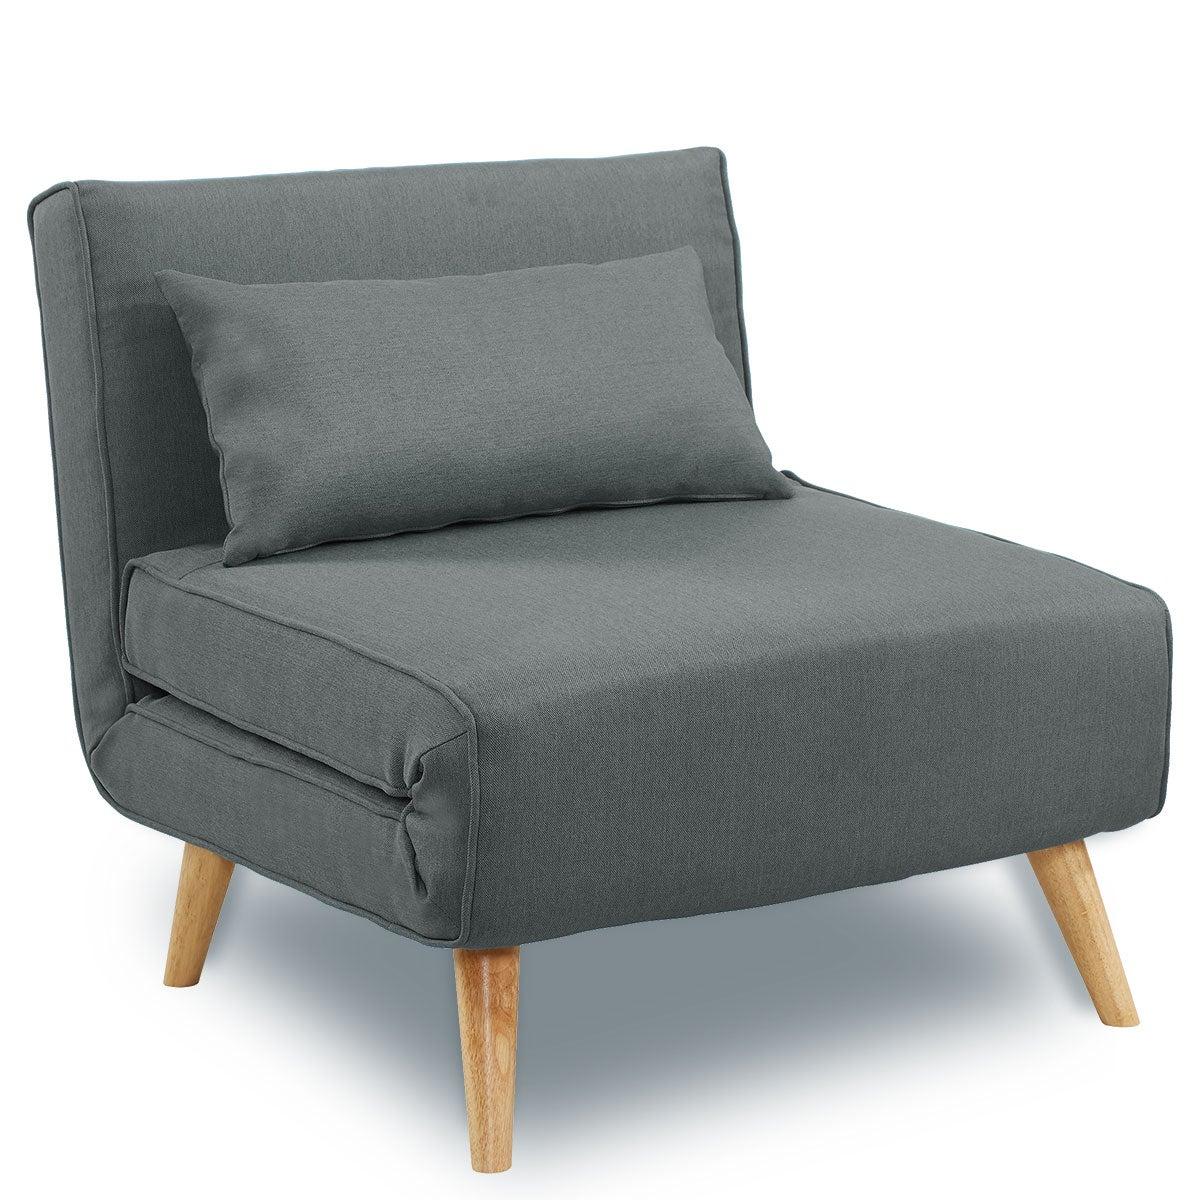 Linen Corner Sofa Bed Comfortable Chair Single Seater